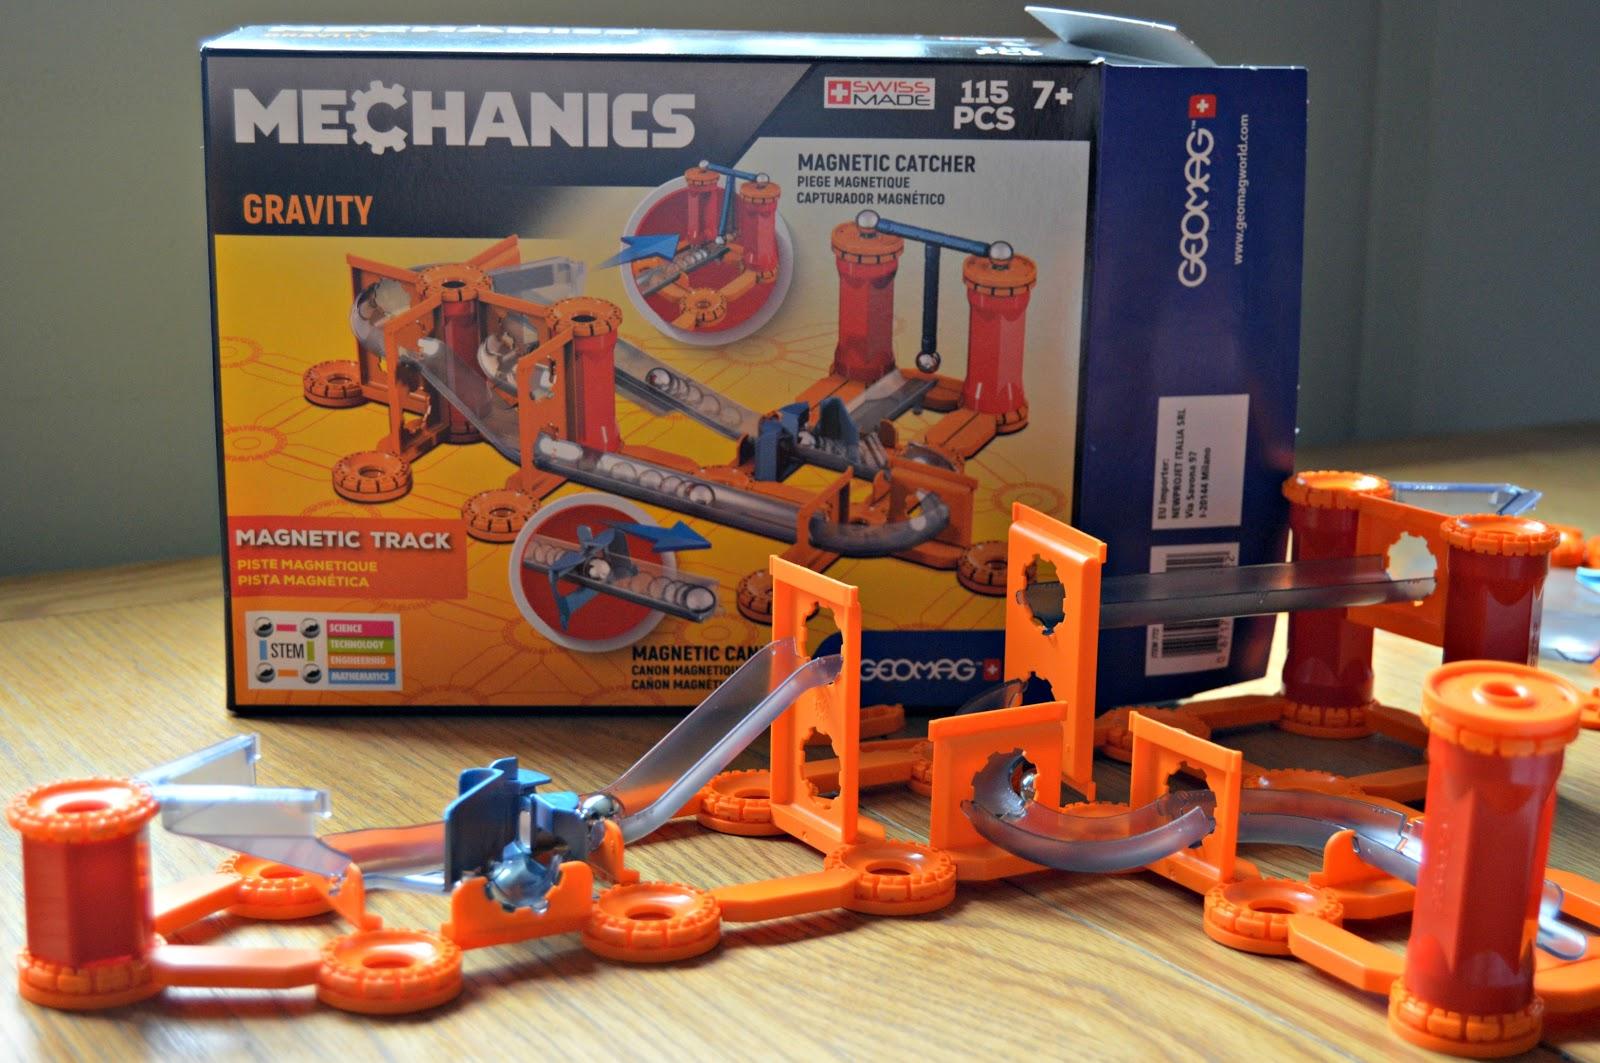 Mechanics Gravity Magnetic Track